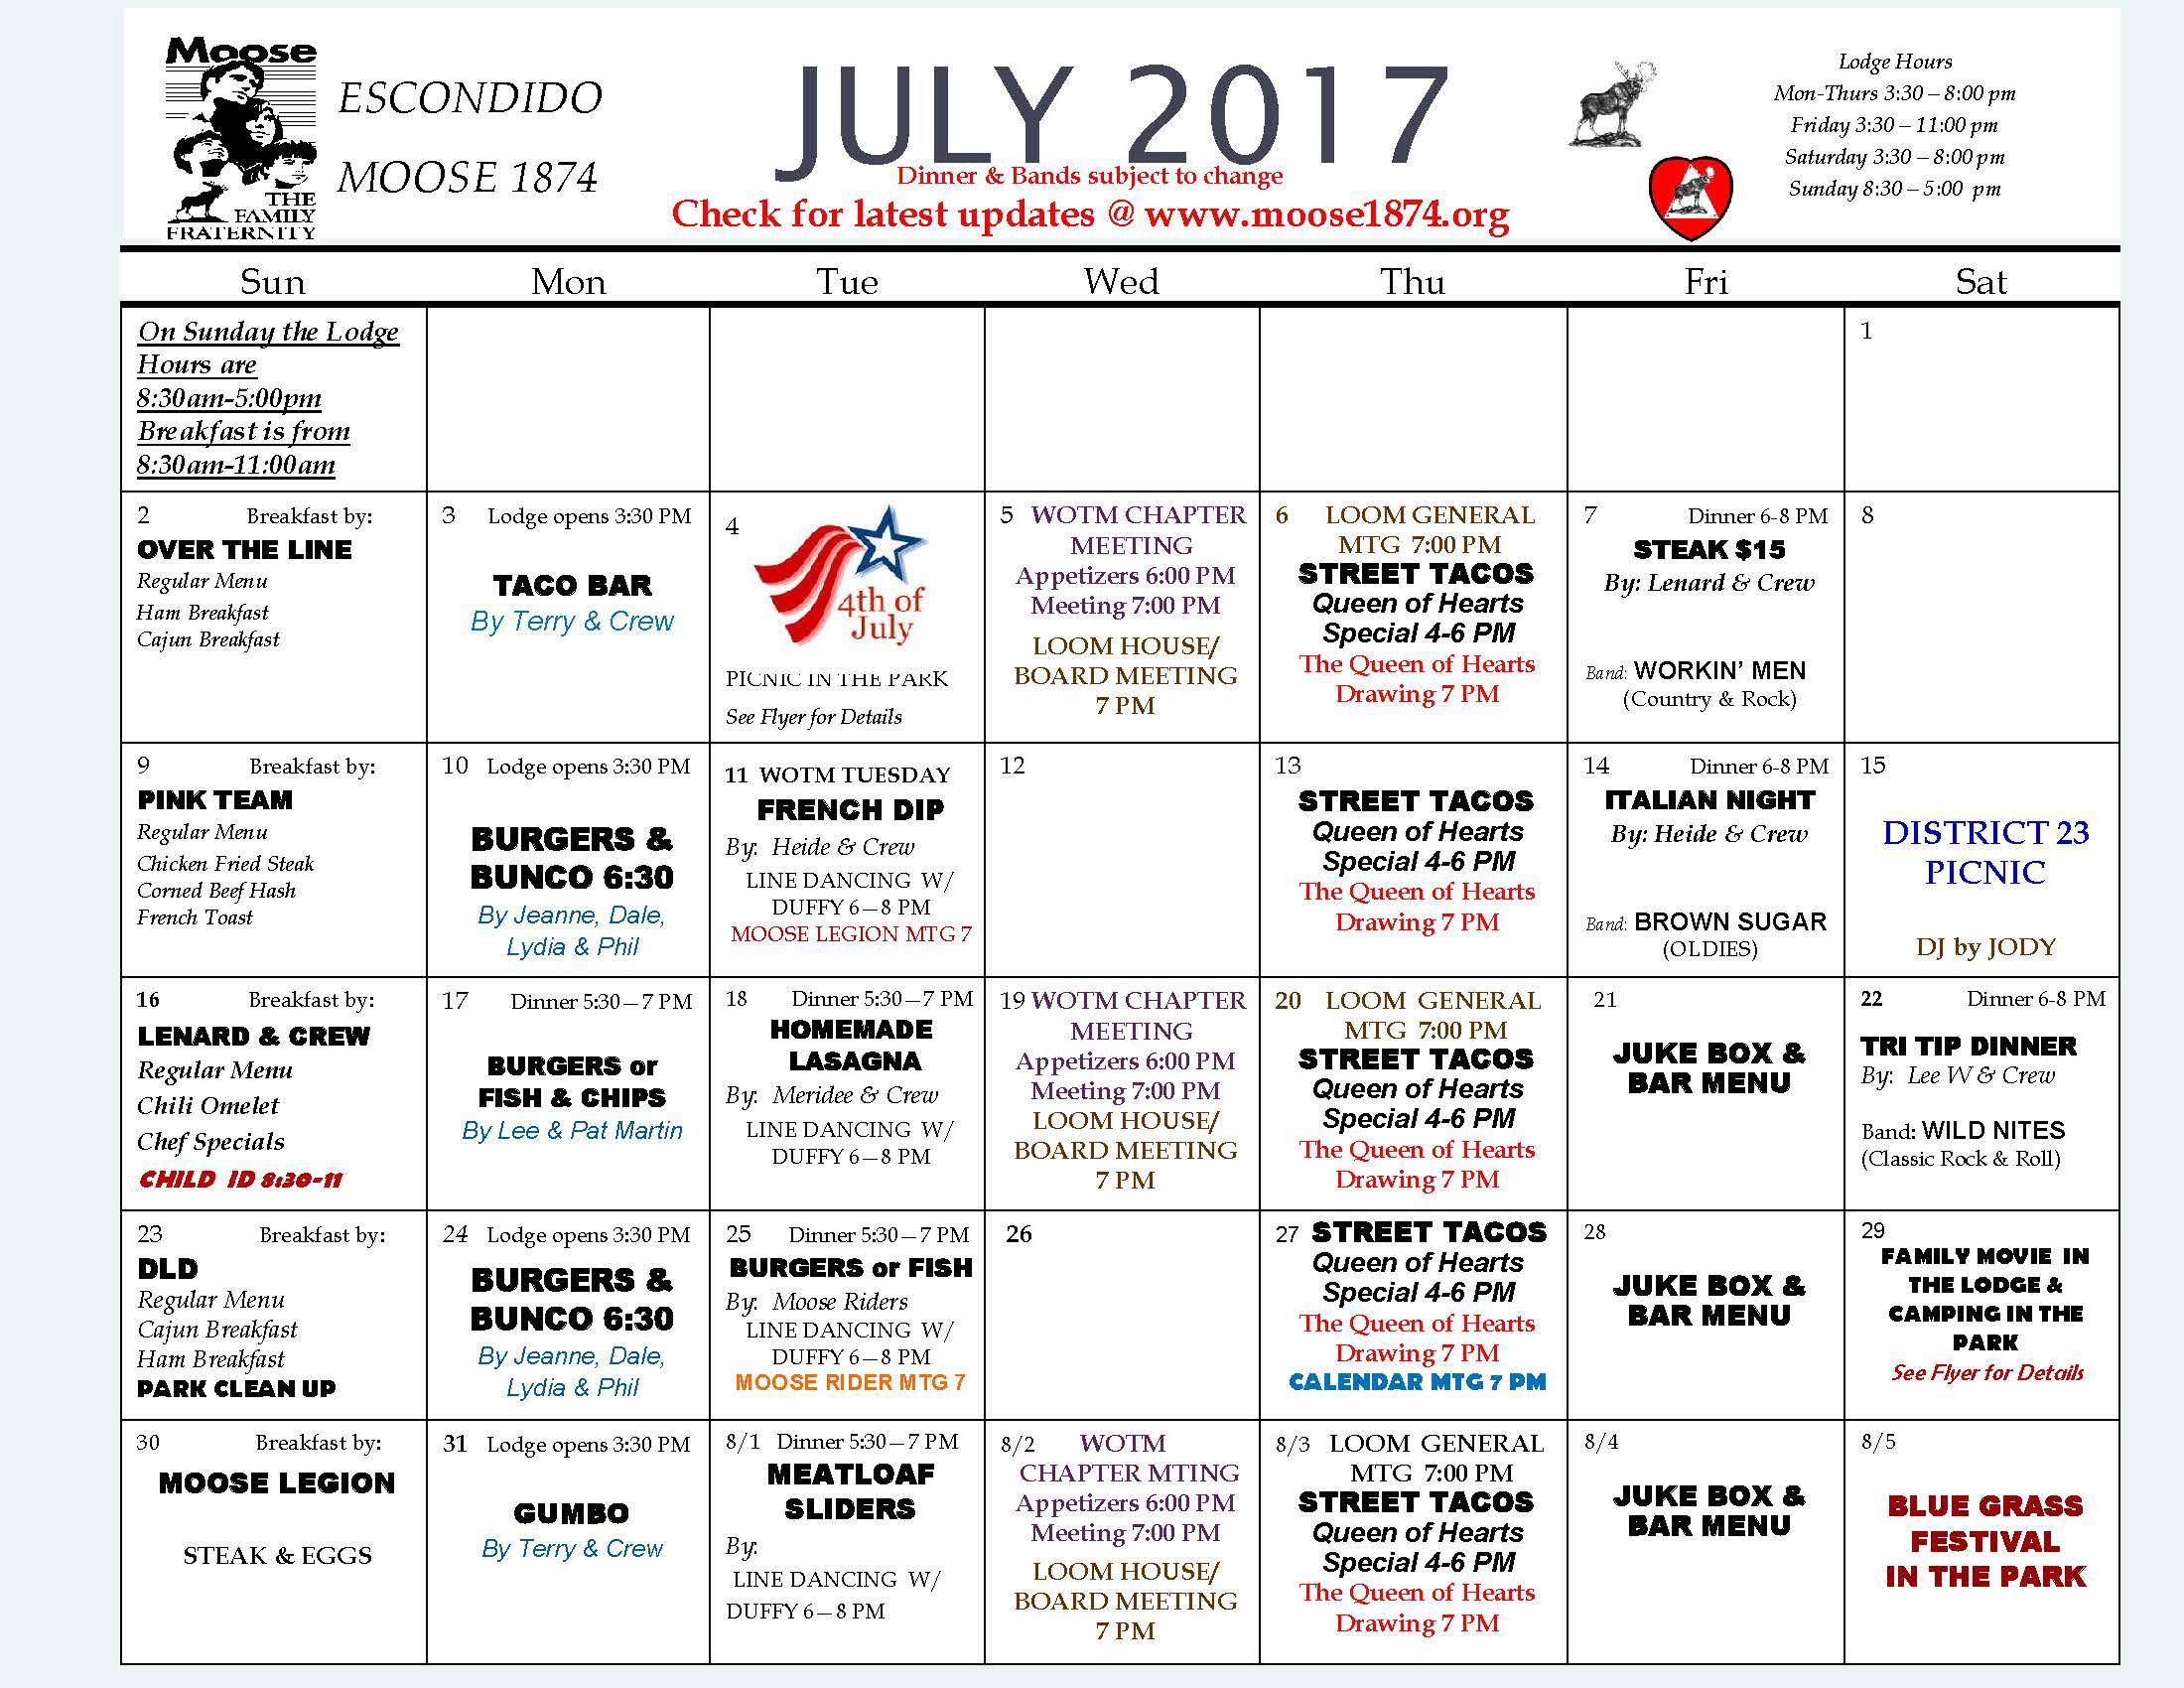 Moose Calendar JULY 2017 - Moose 1874